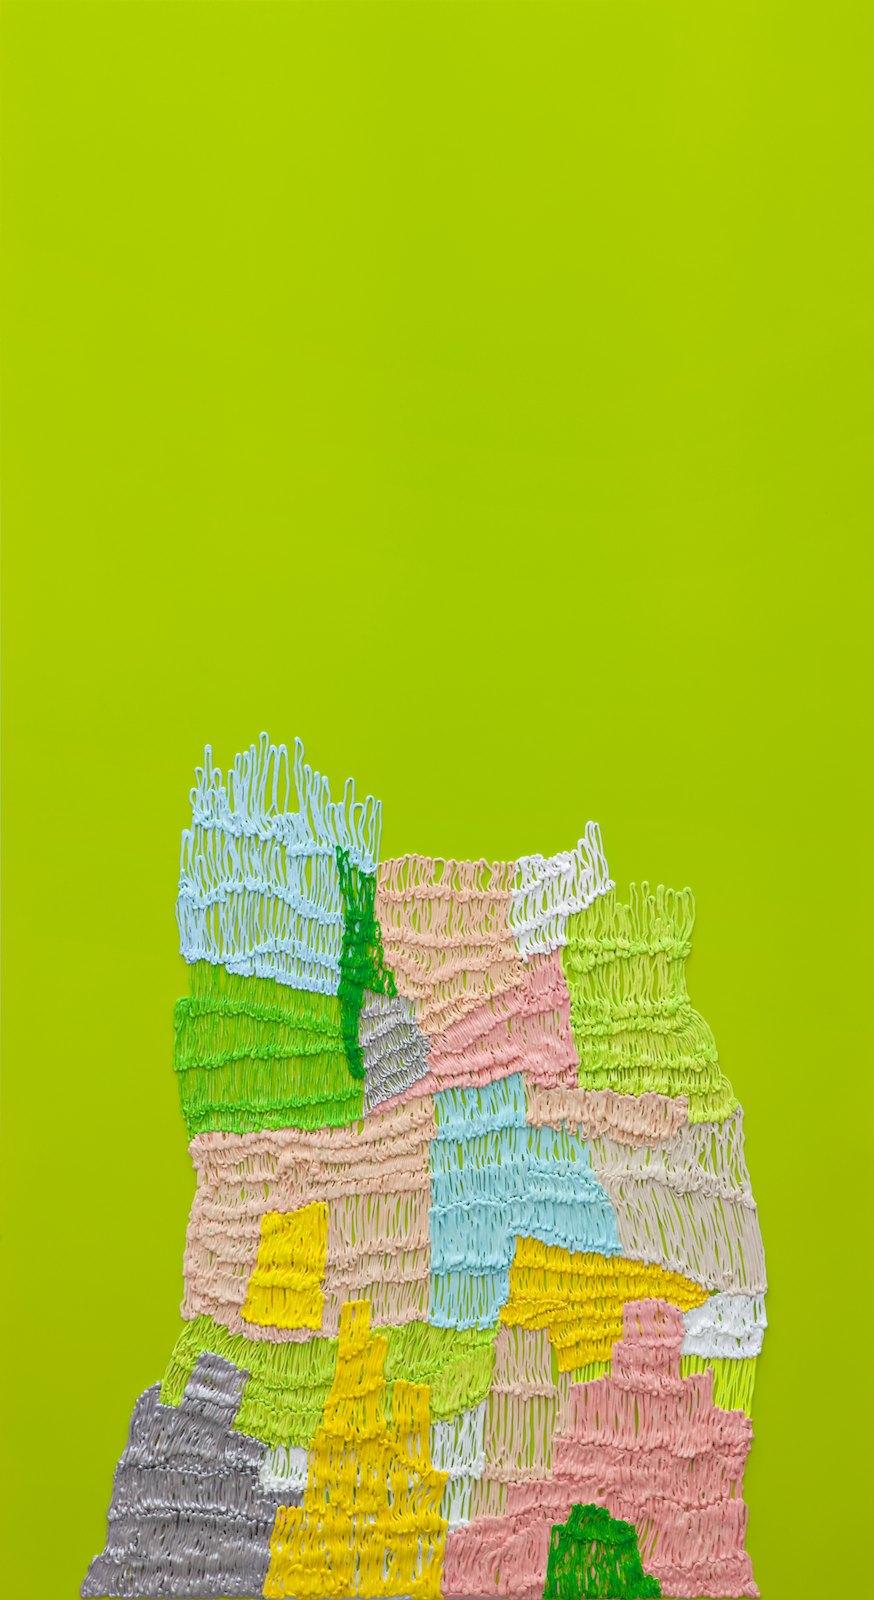 Handmade # 6, 2011-2012, acrylic on alucore, 220 x 120 cm